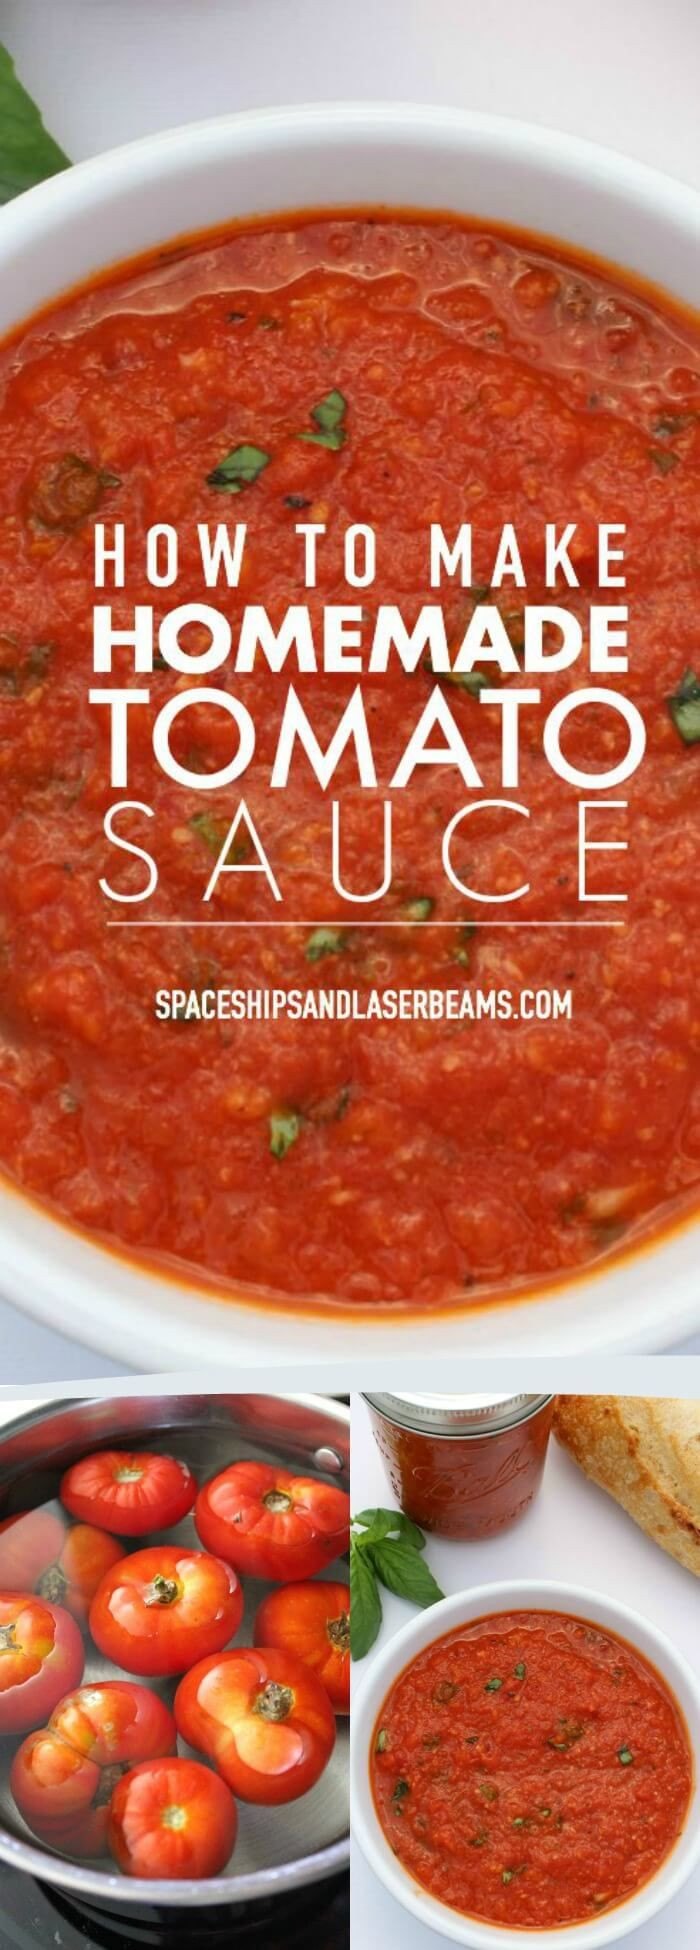 Homemade Spaghetti Sauce From Fresh Tomatoes Real Italian  How to Make a Delicious Homemade Tomato Sauce via